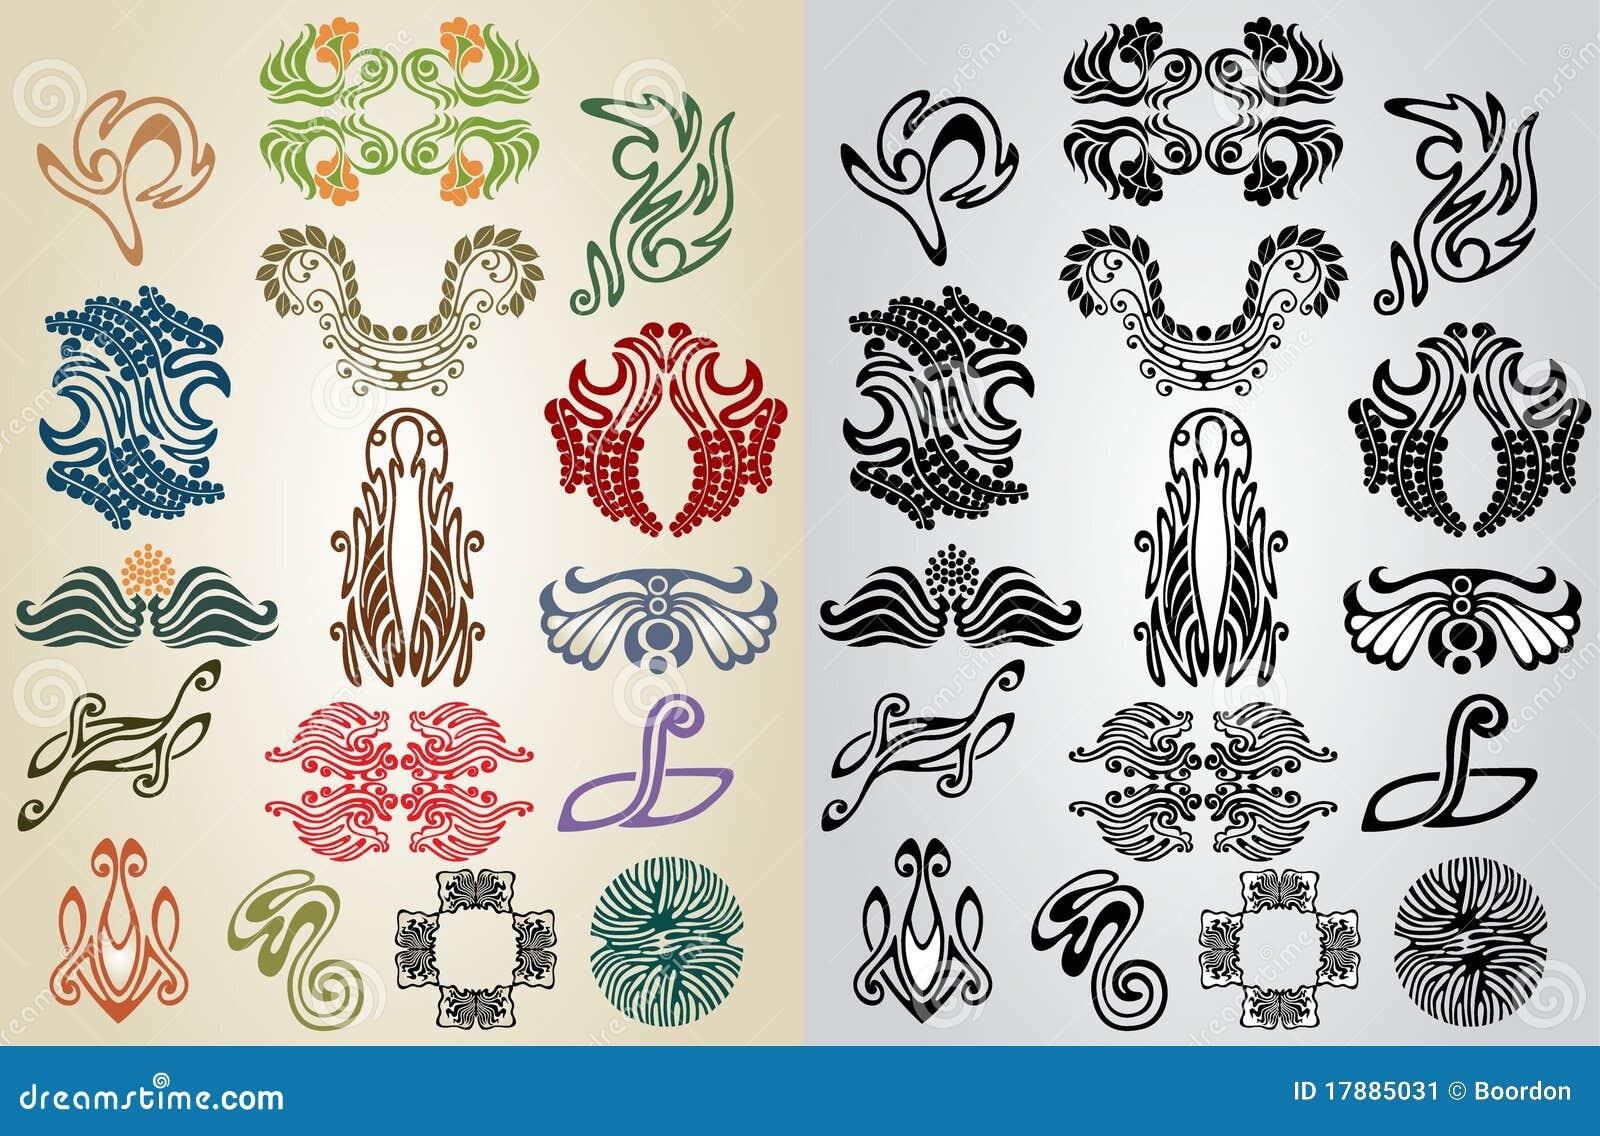 Elements Of Art Pattern : Element pattern art nouveau collection stock image